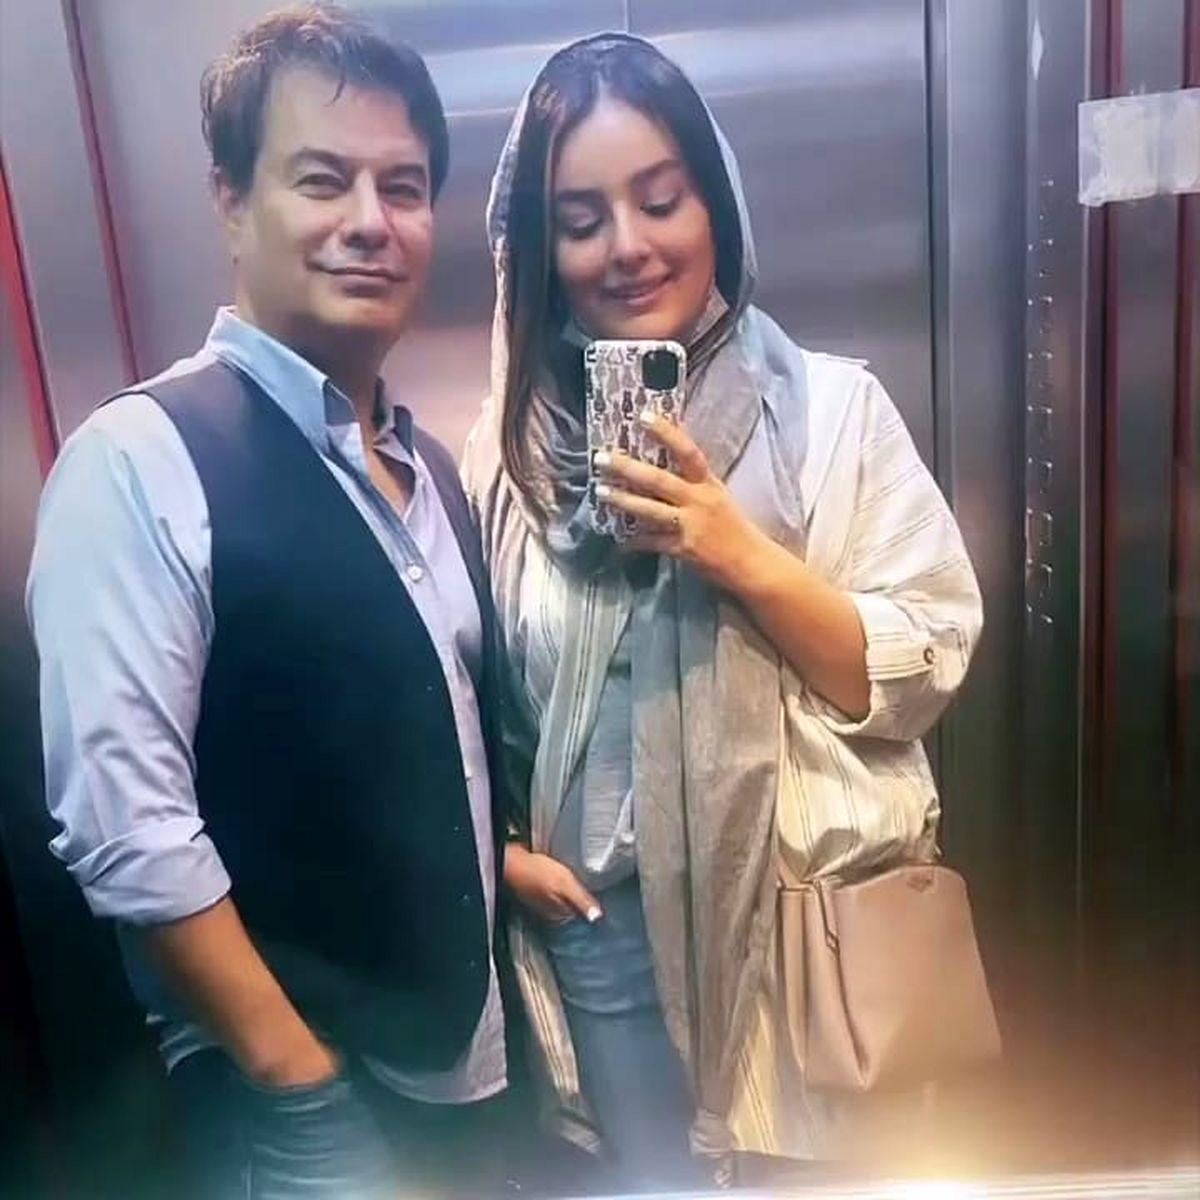 عکس عاشقانه پیمان قاسم خانی و همسرش در آسانسور